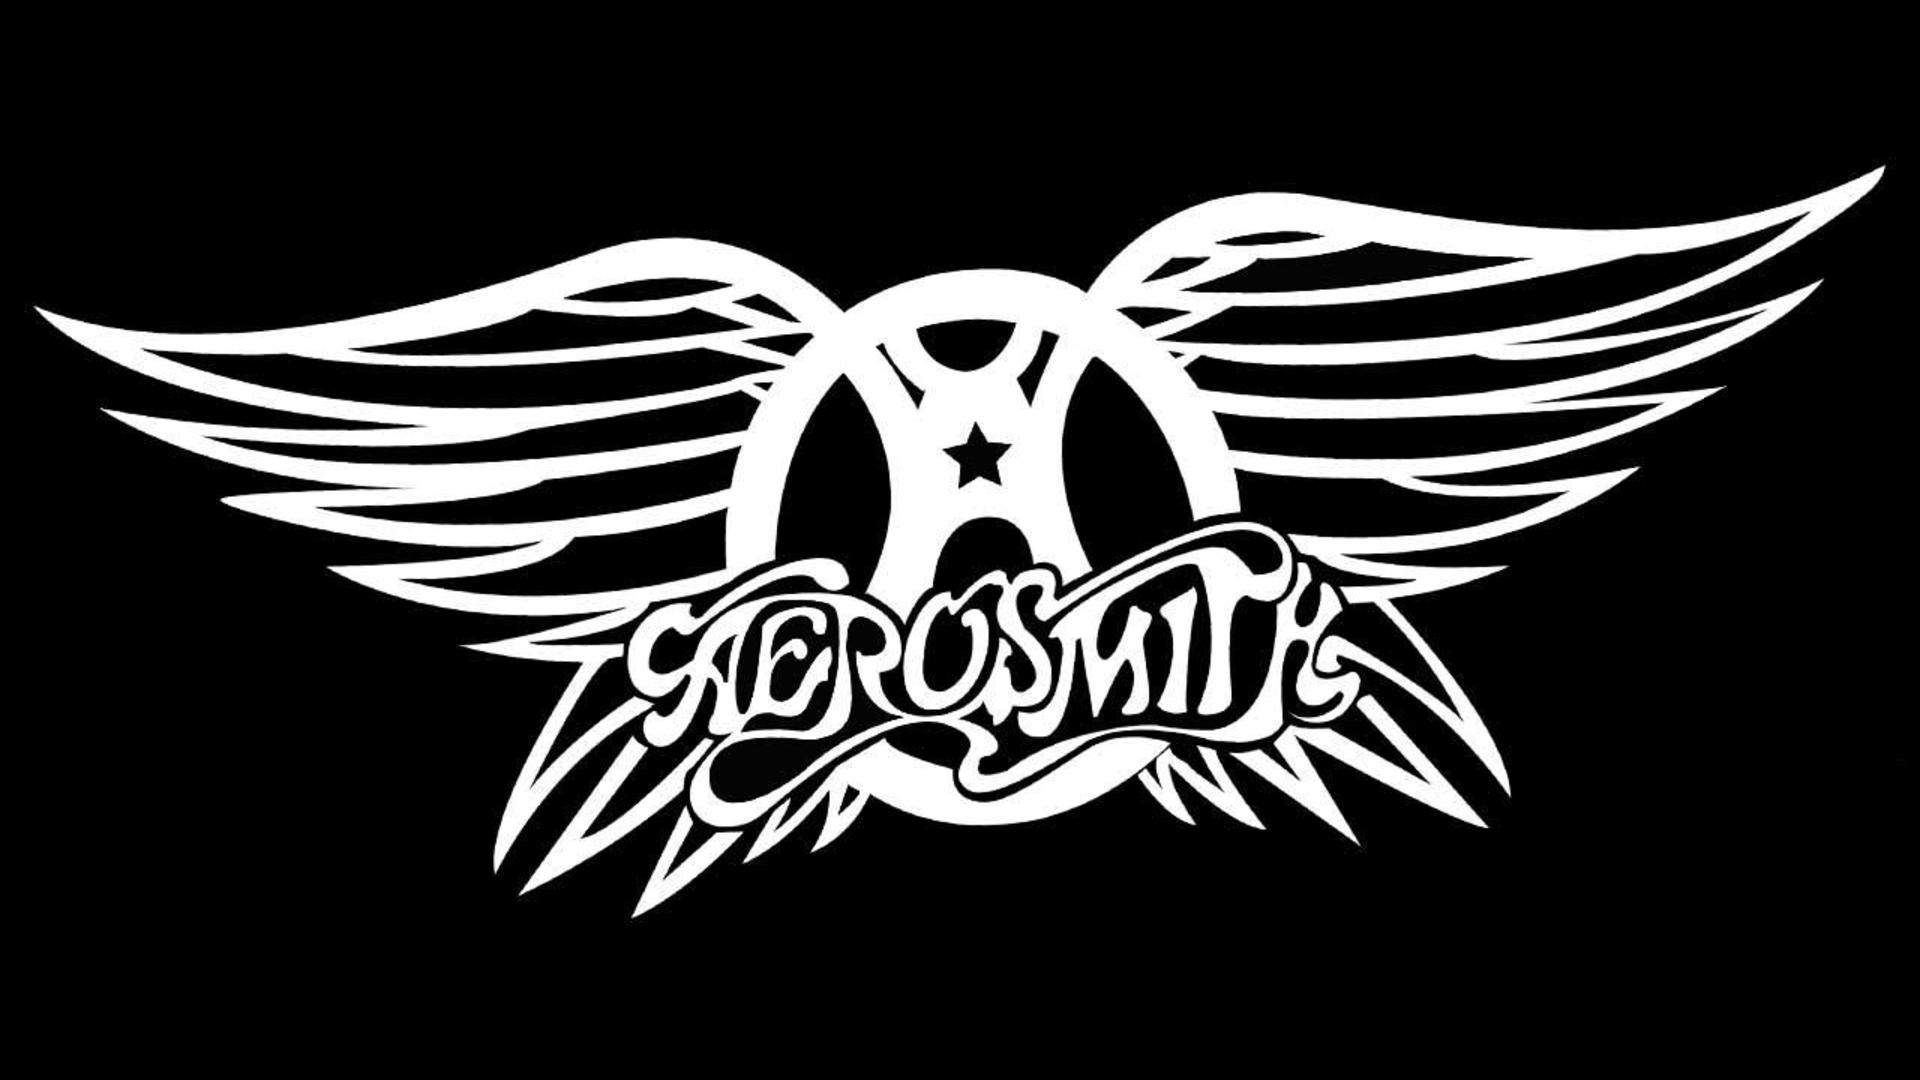 aerosmith-logo jpg Aerosmith